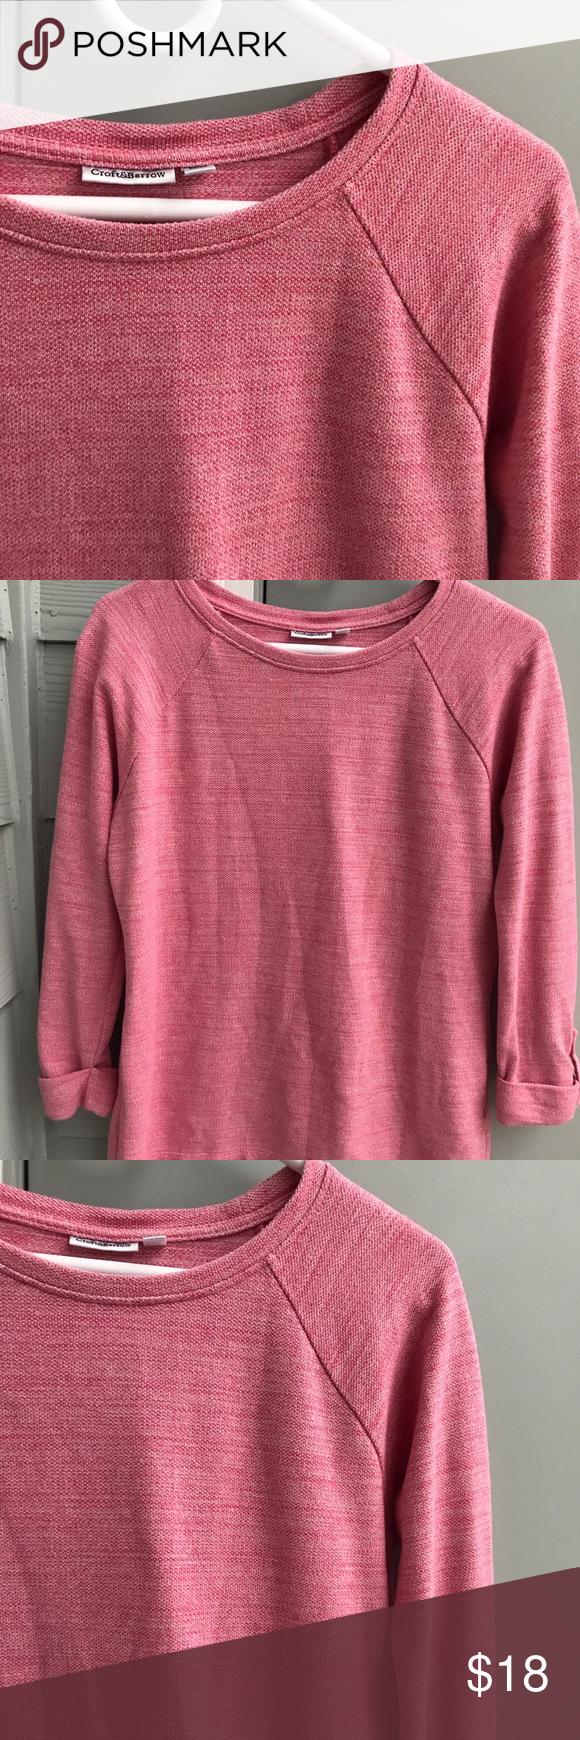 Pink Sweatshirt Sweater Sweaters Pink Sweatshirt Sweatshirt Sweater [ 1740 x 580 Pixel ]